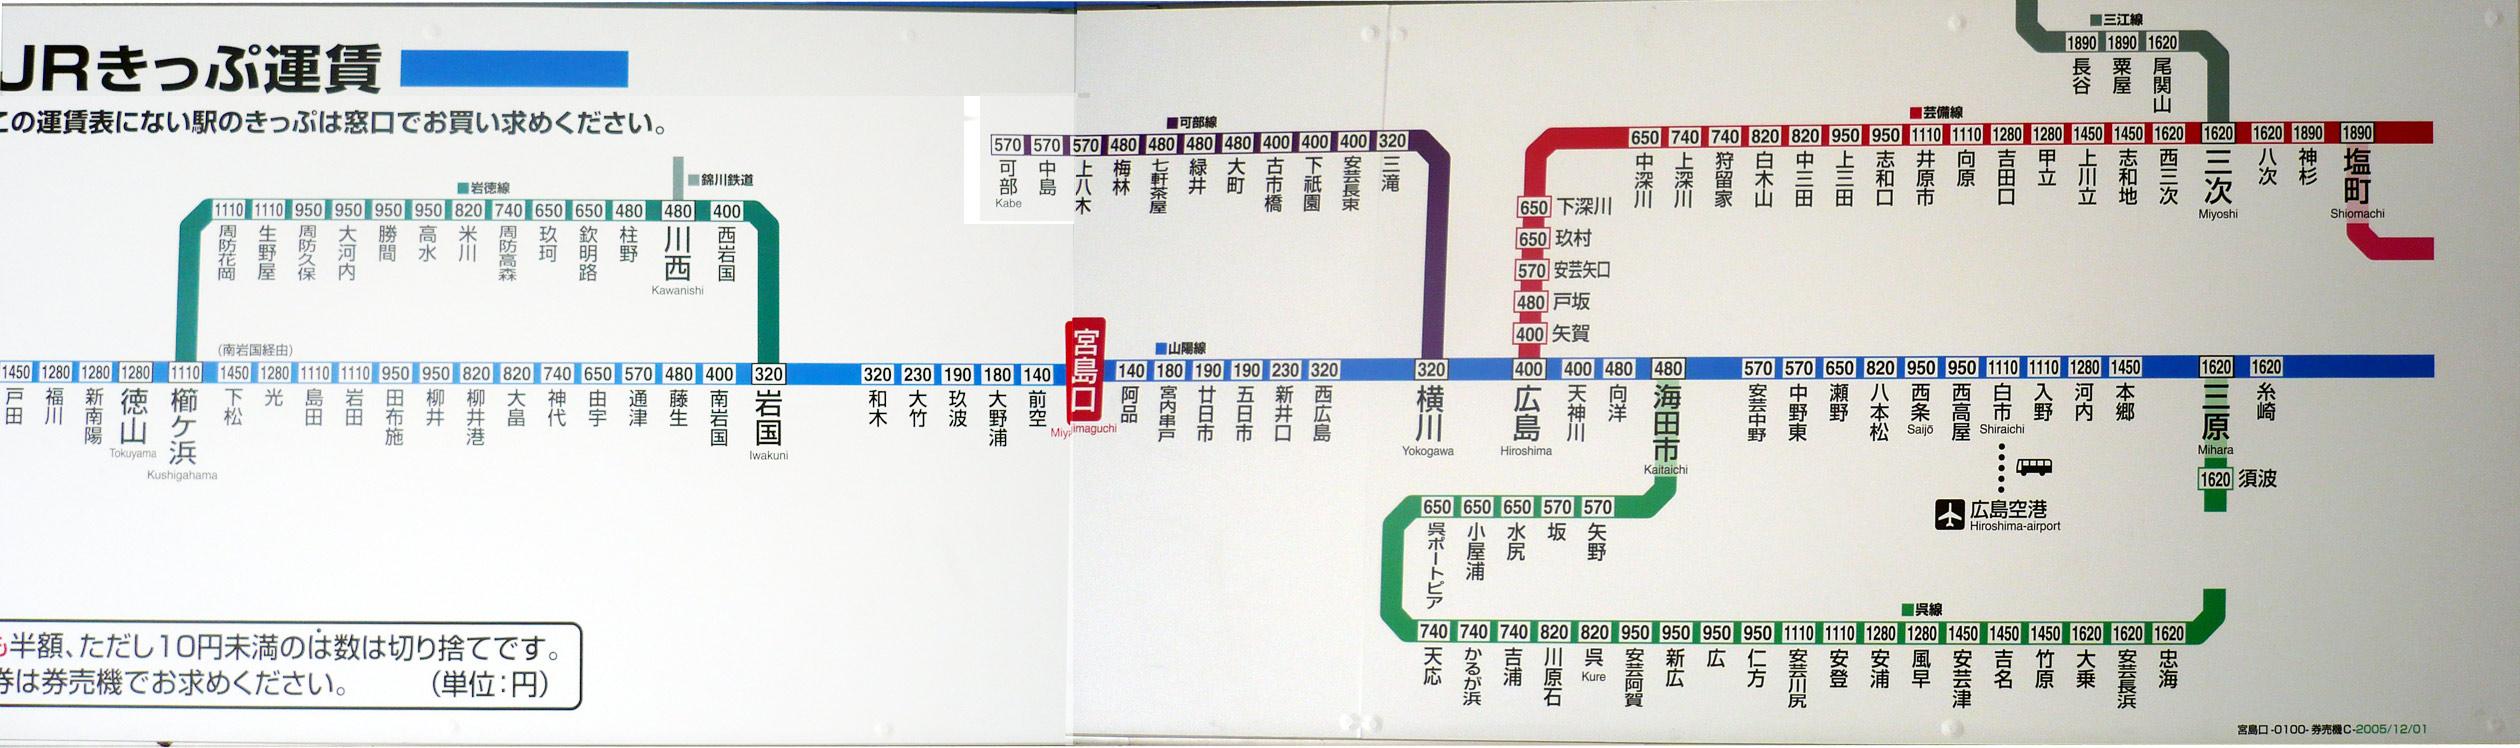 【JR西日本】 岡山・福山エリアの路線図、「灰色路 …